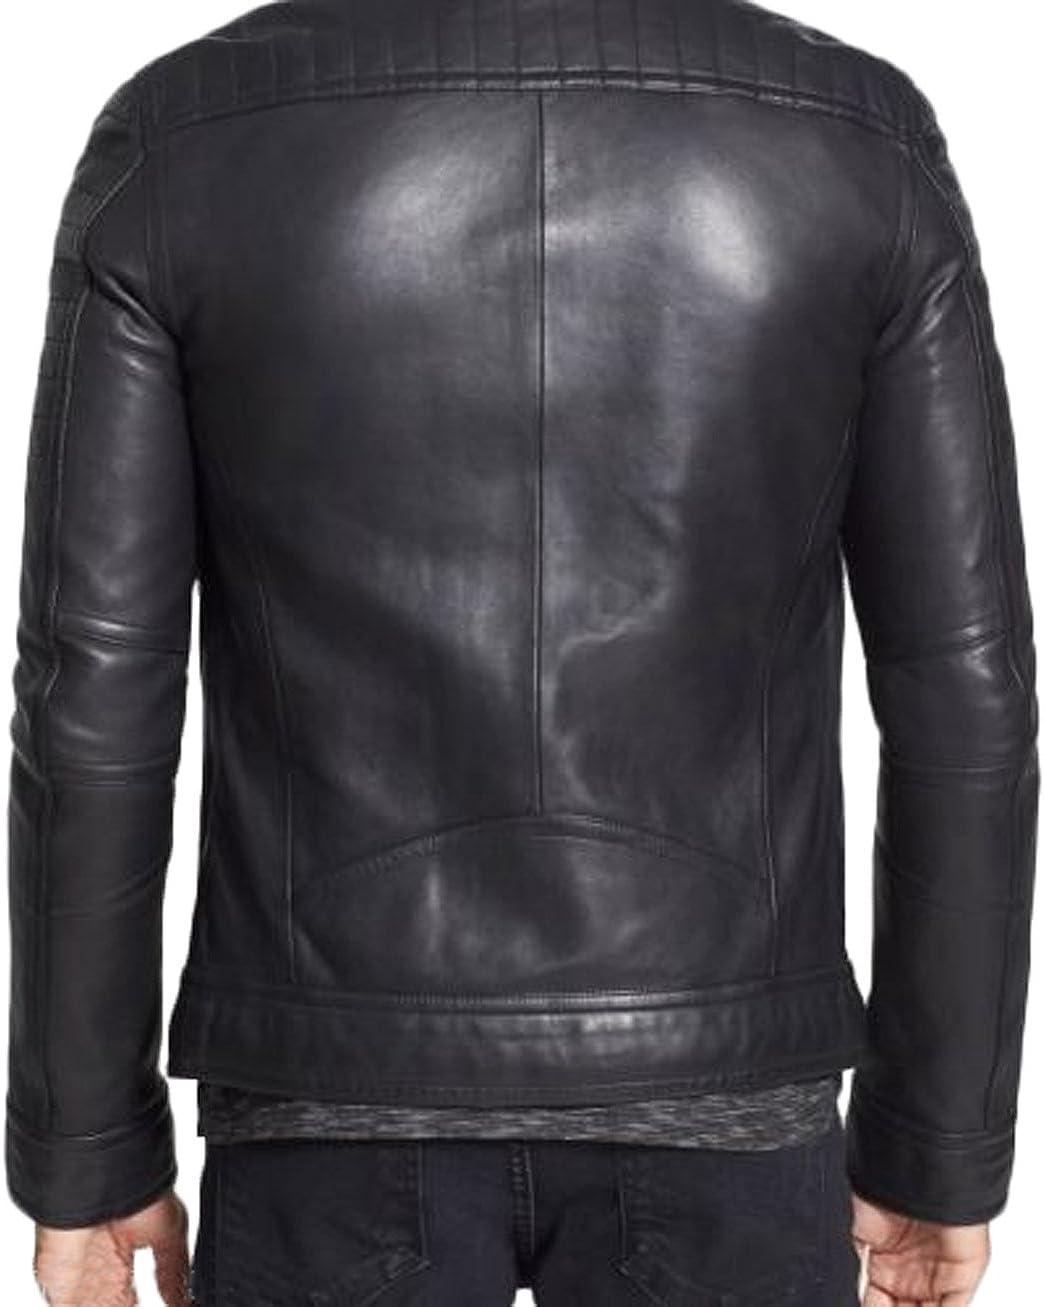 Men Leather Jacket New Soft Lambskin Slim Biker Bomber Coat LTN1278